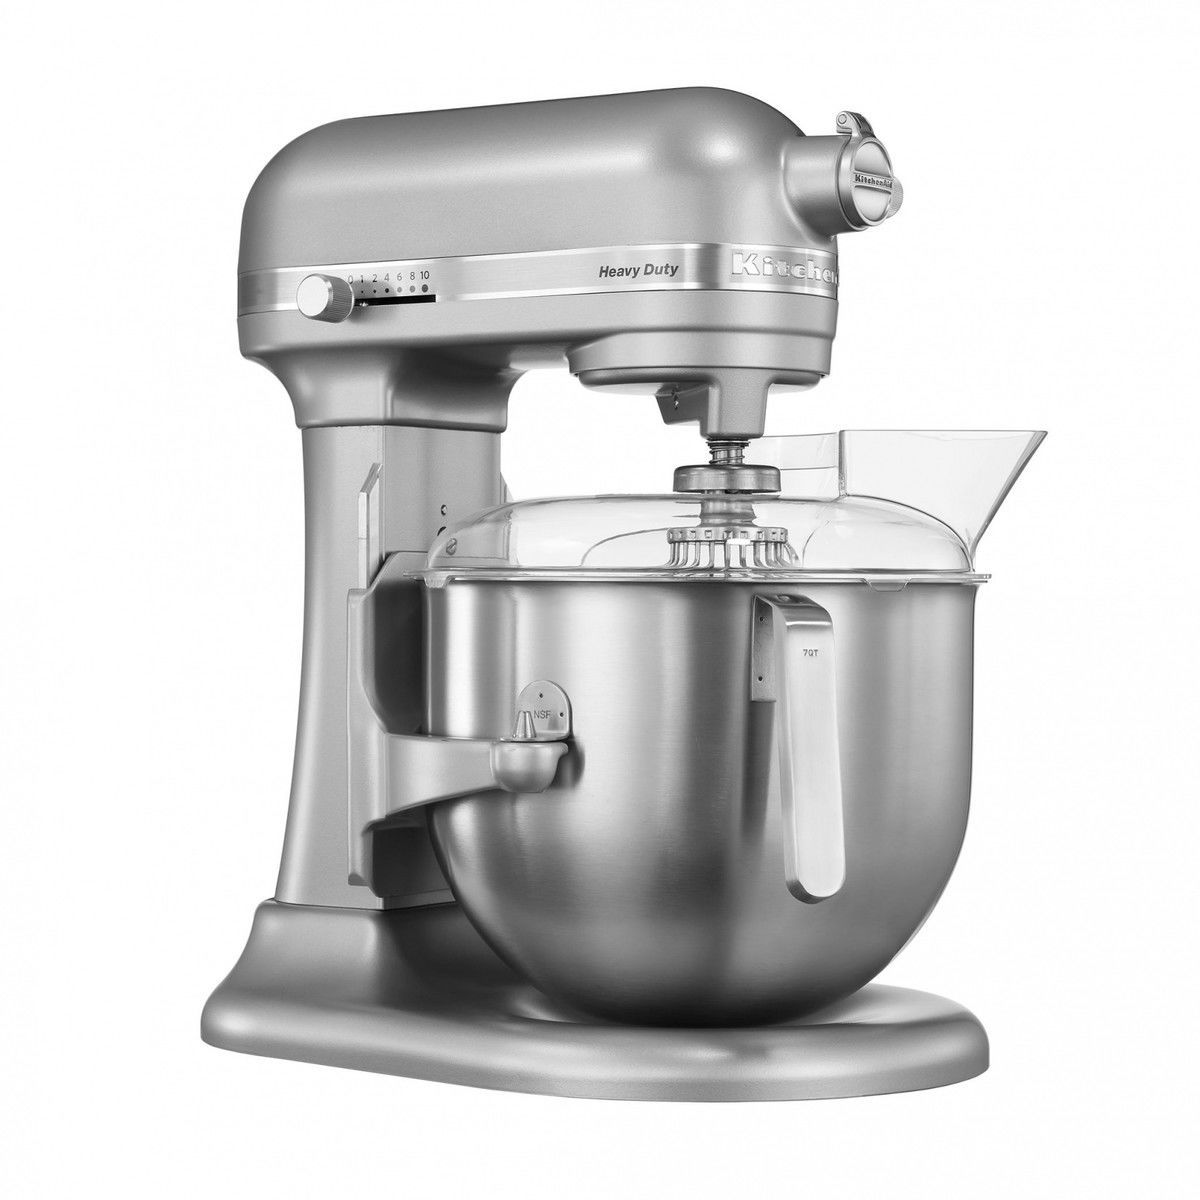 kitchenaid küchenmaschine heavy duty 1.3 hp